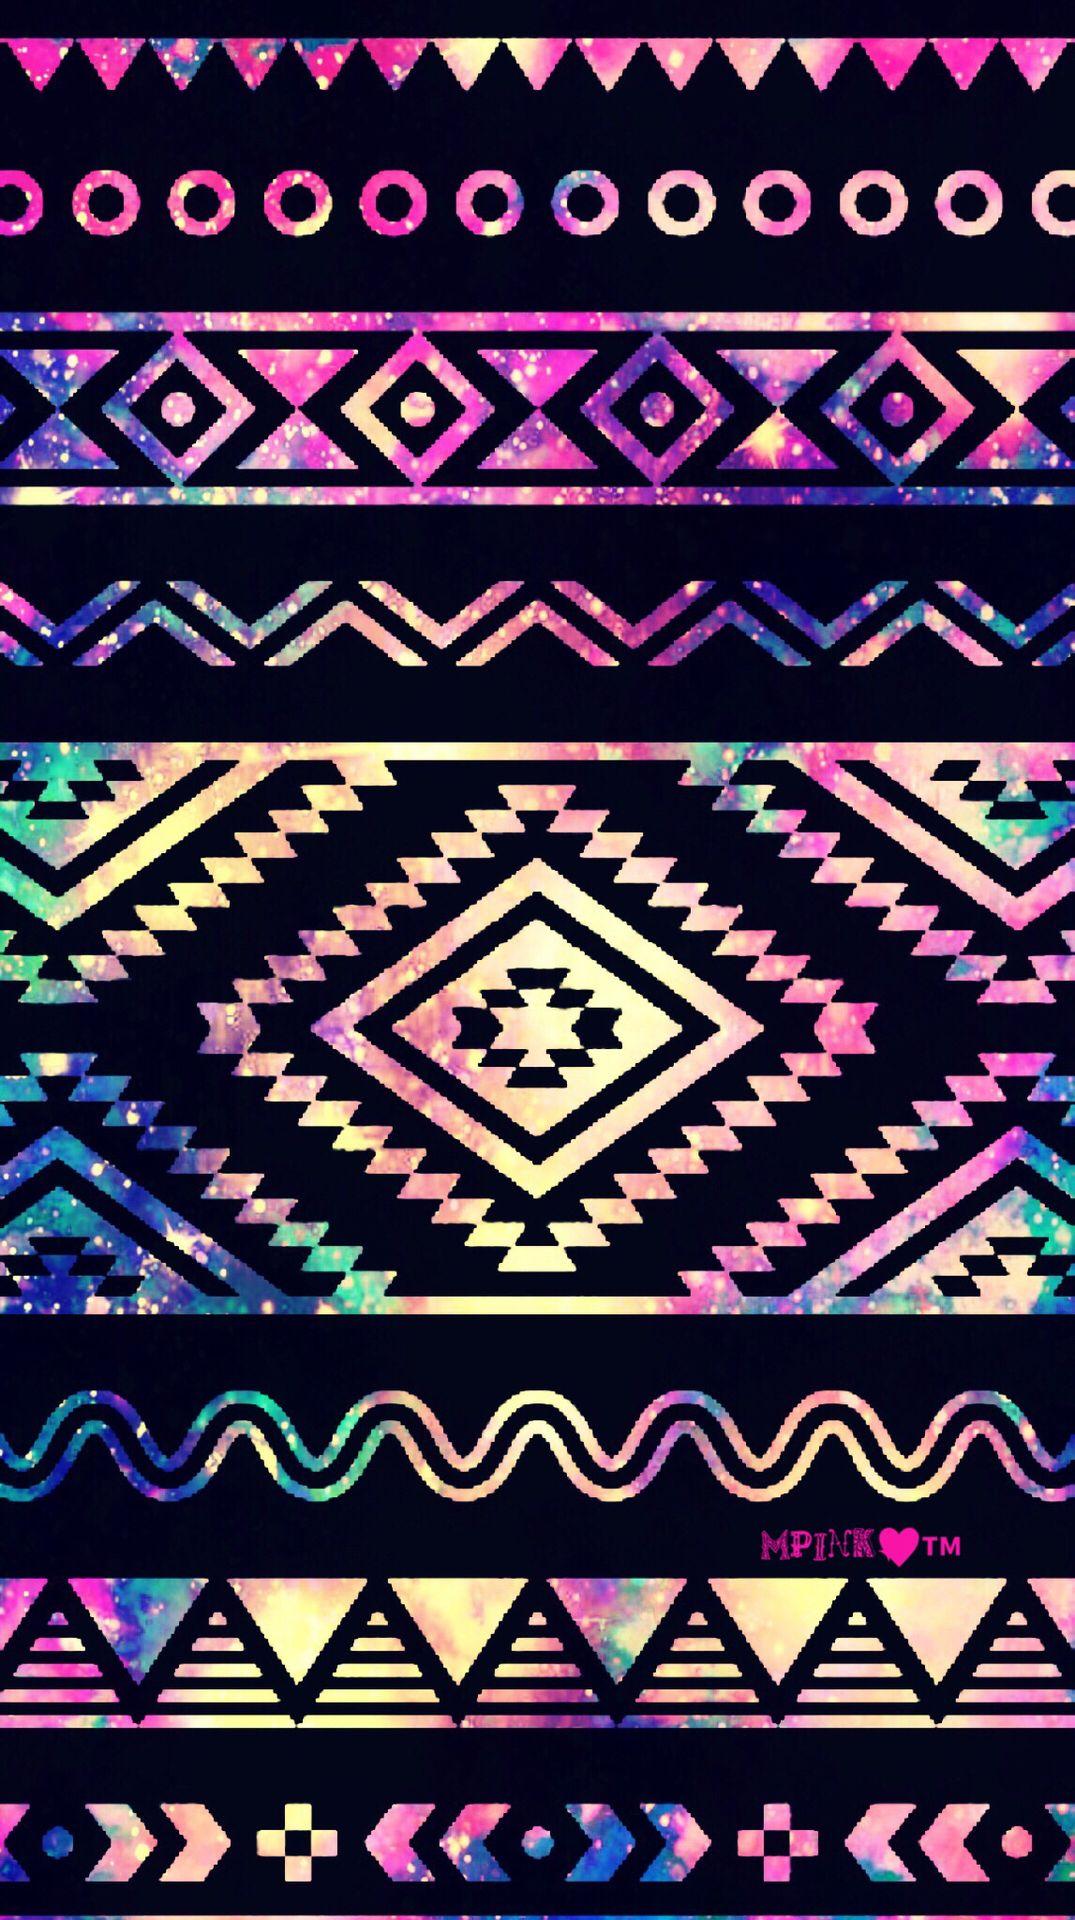 Cute Neon Aztec Galaxy Wallpaper Androidwallpaper Iphonewallpaper Wallpaper Galaxy Sparkle Glitt Tribal Print Wallpaper Galaxy Wallpaper Tribal Wallpaper